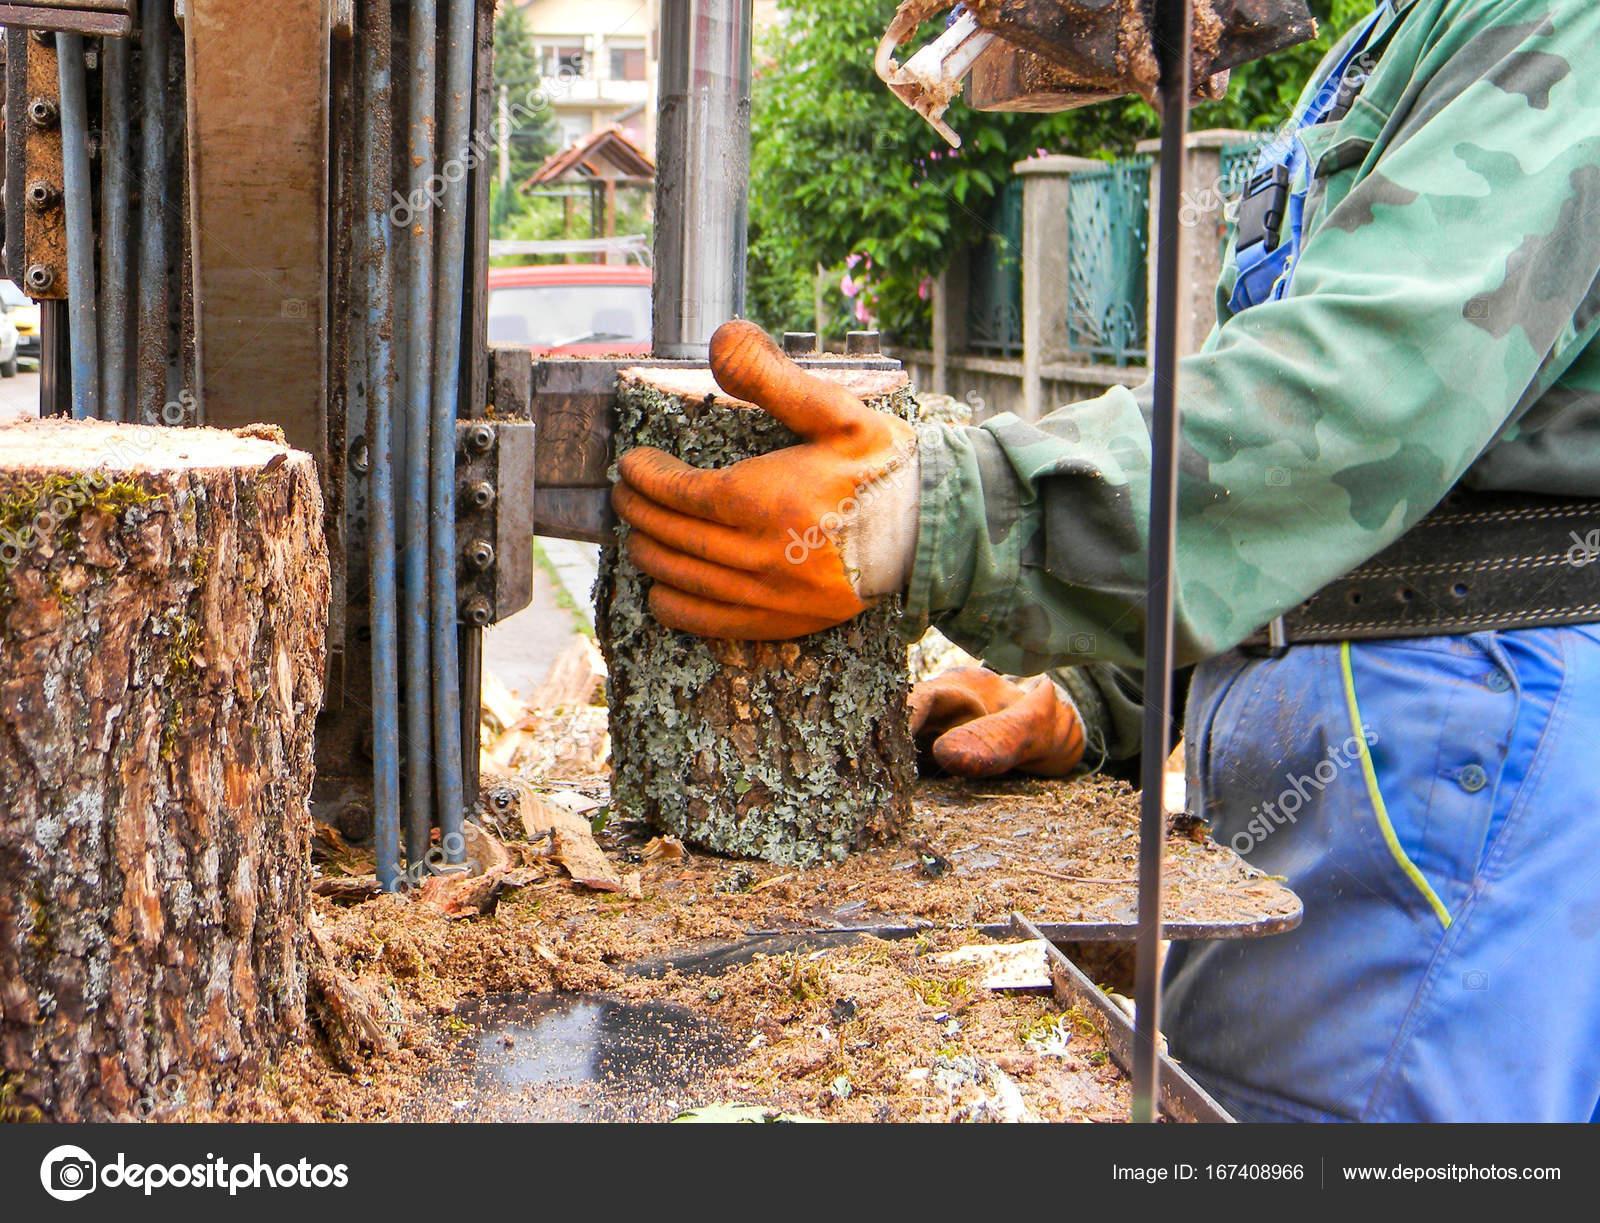 006577b0c3 Εργαζόμενος με ένα μηχάνημα για κοπή καυσόξυλων — Φωτογραφία Αρχείου ...